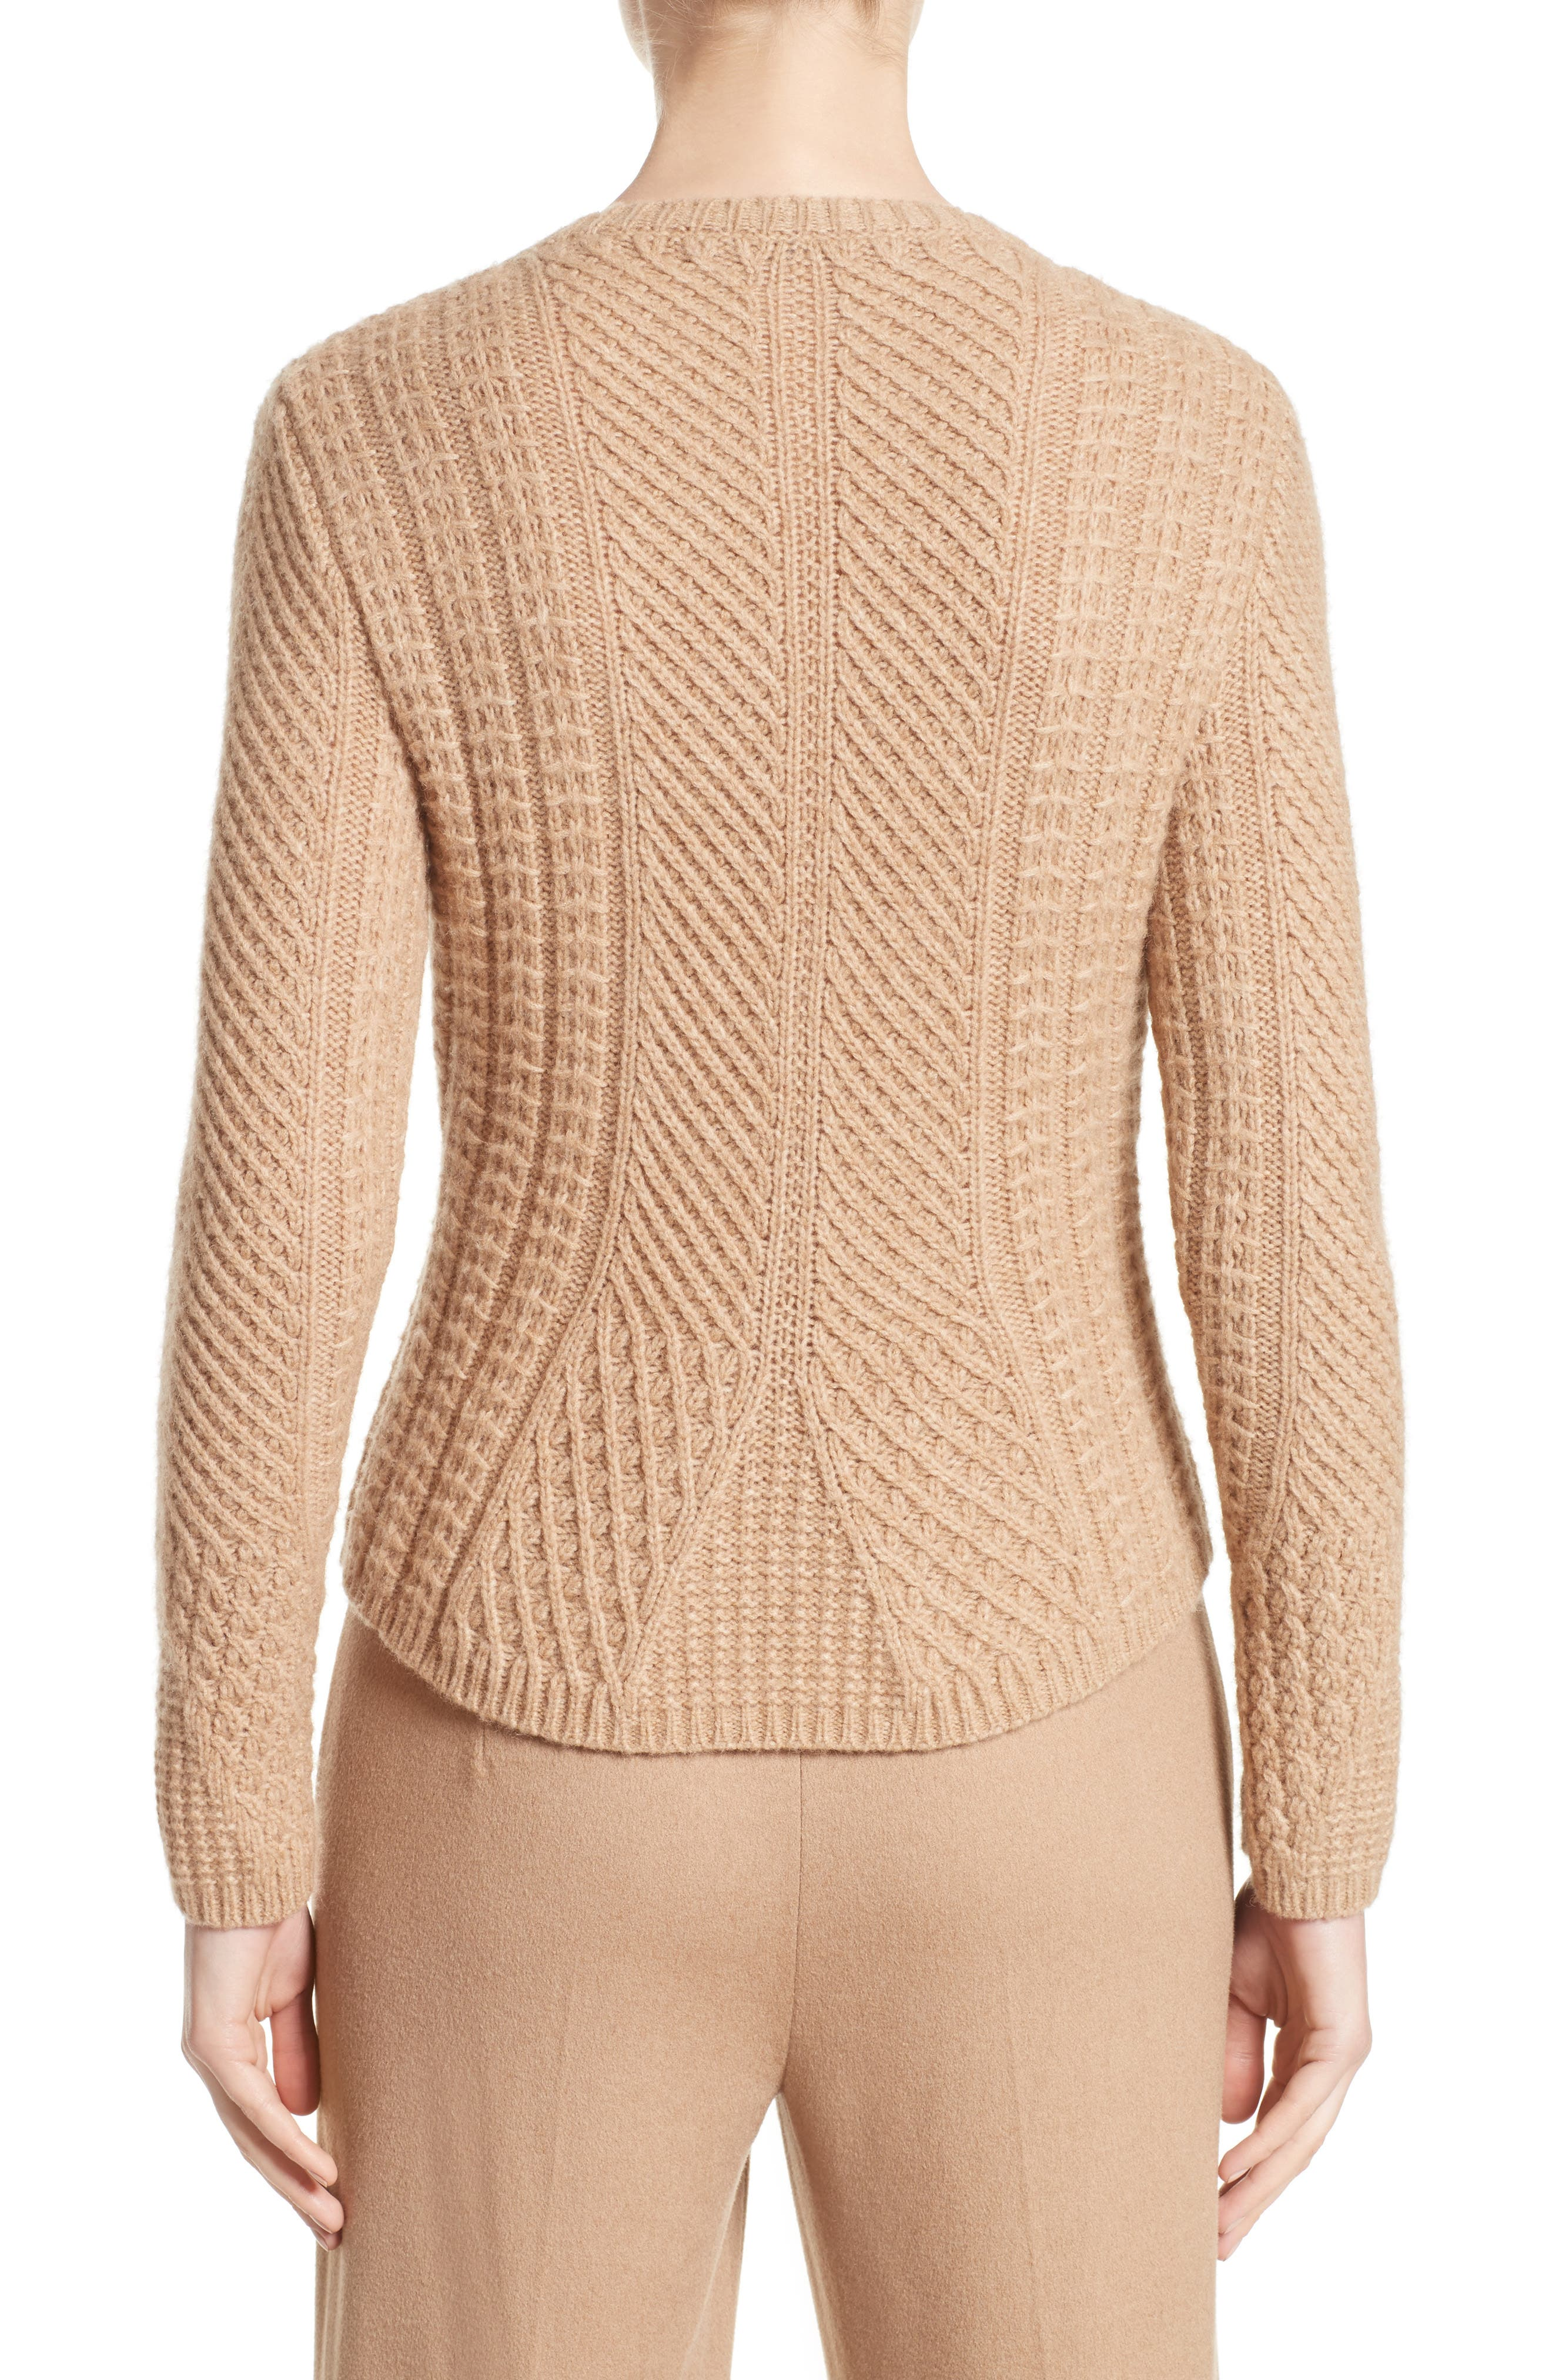 Ronco Sweater,                             Alternate thumbnail 2, color,                             Camel